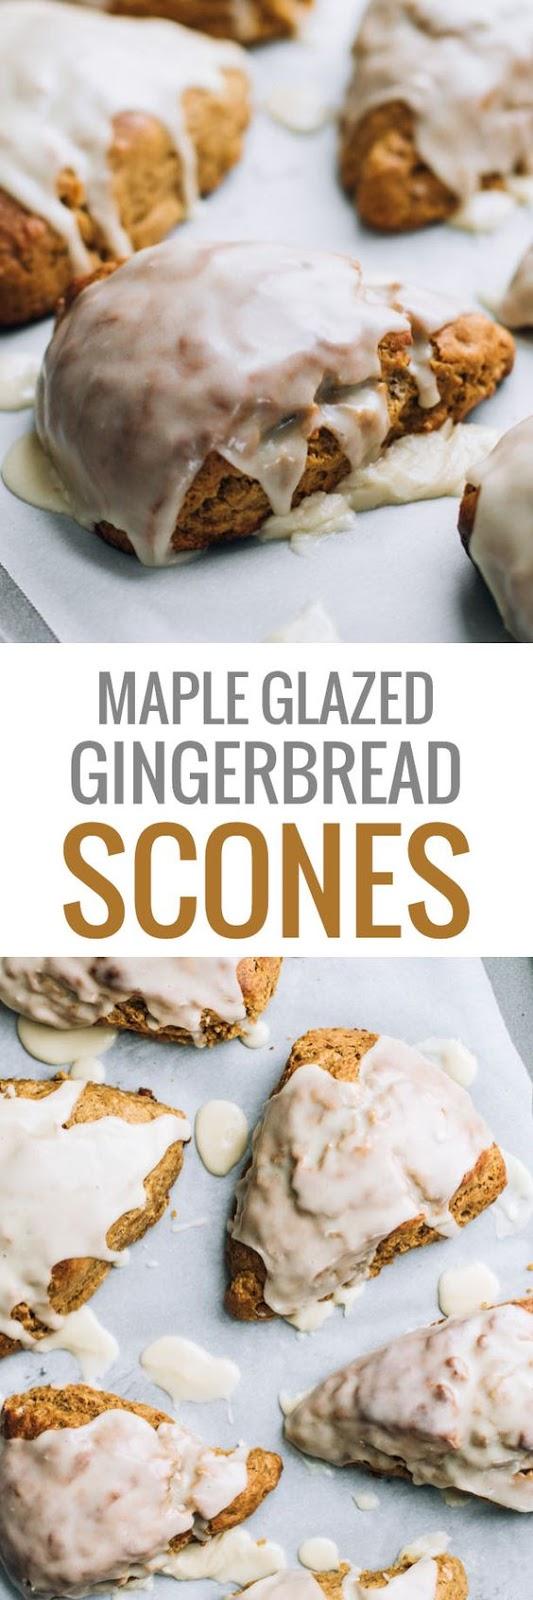 Maple Glazed Gingerbread Scones #chrismast #gingerbread #snack #slidedish #dessert #winter